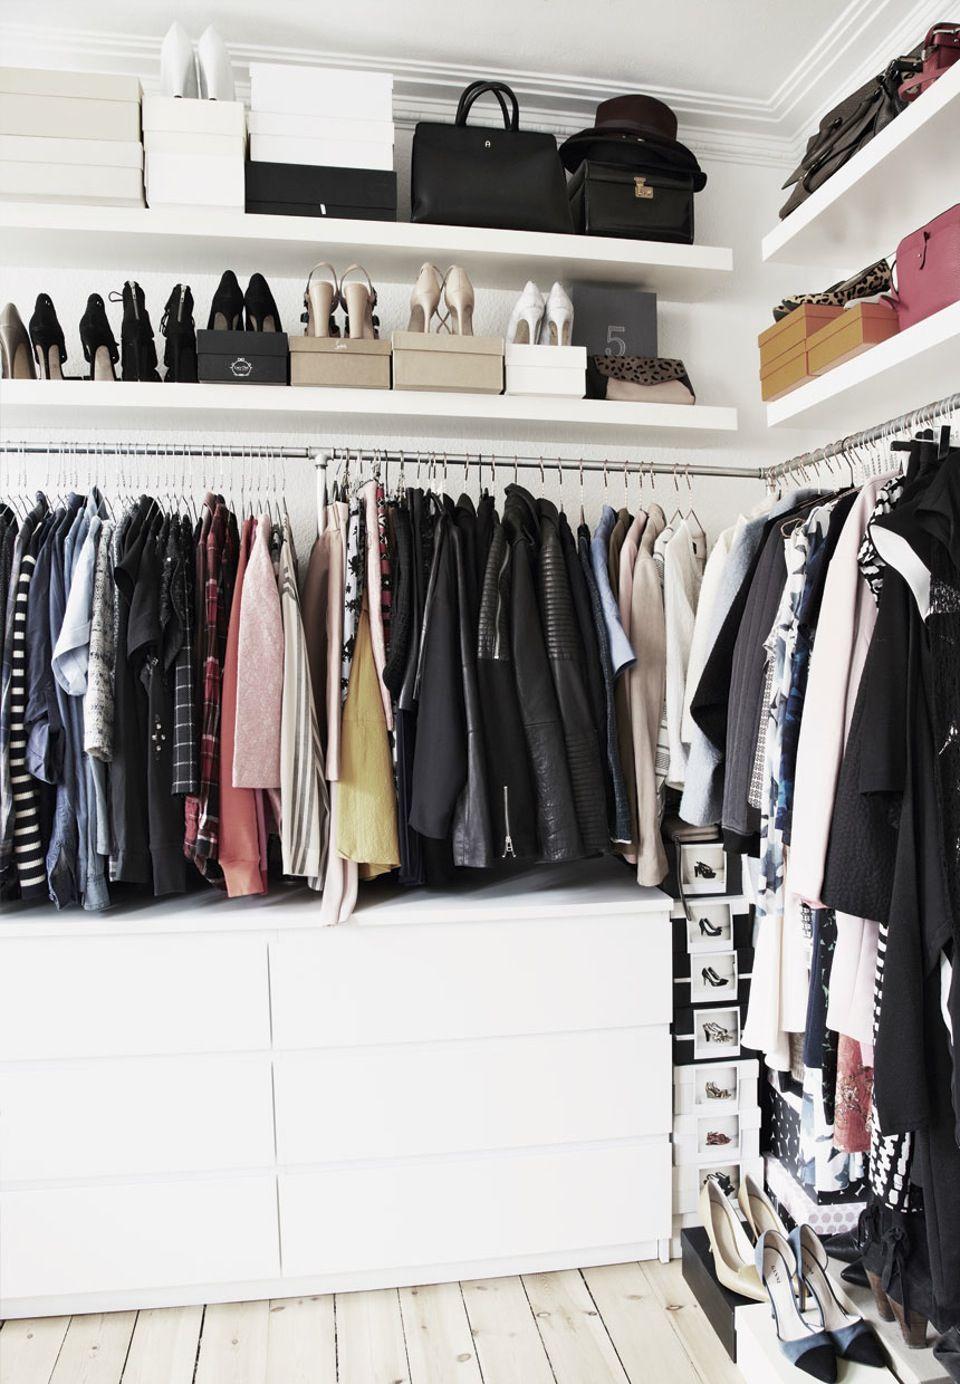 comment adopter une d co pastel scandinave dressing pinterest quartos minhas fotos e. Black Bedroom Furniture Sets. Home Design Ideas